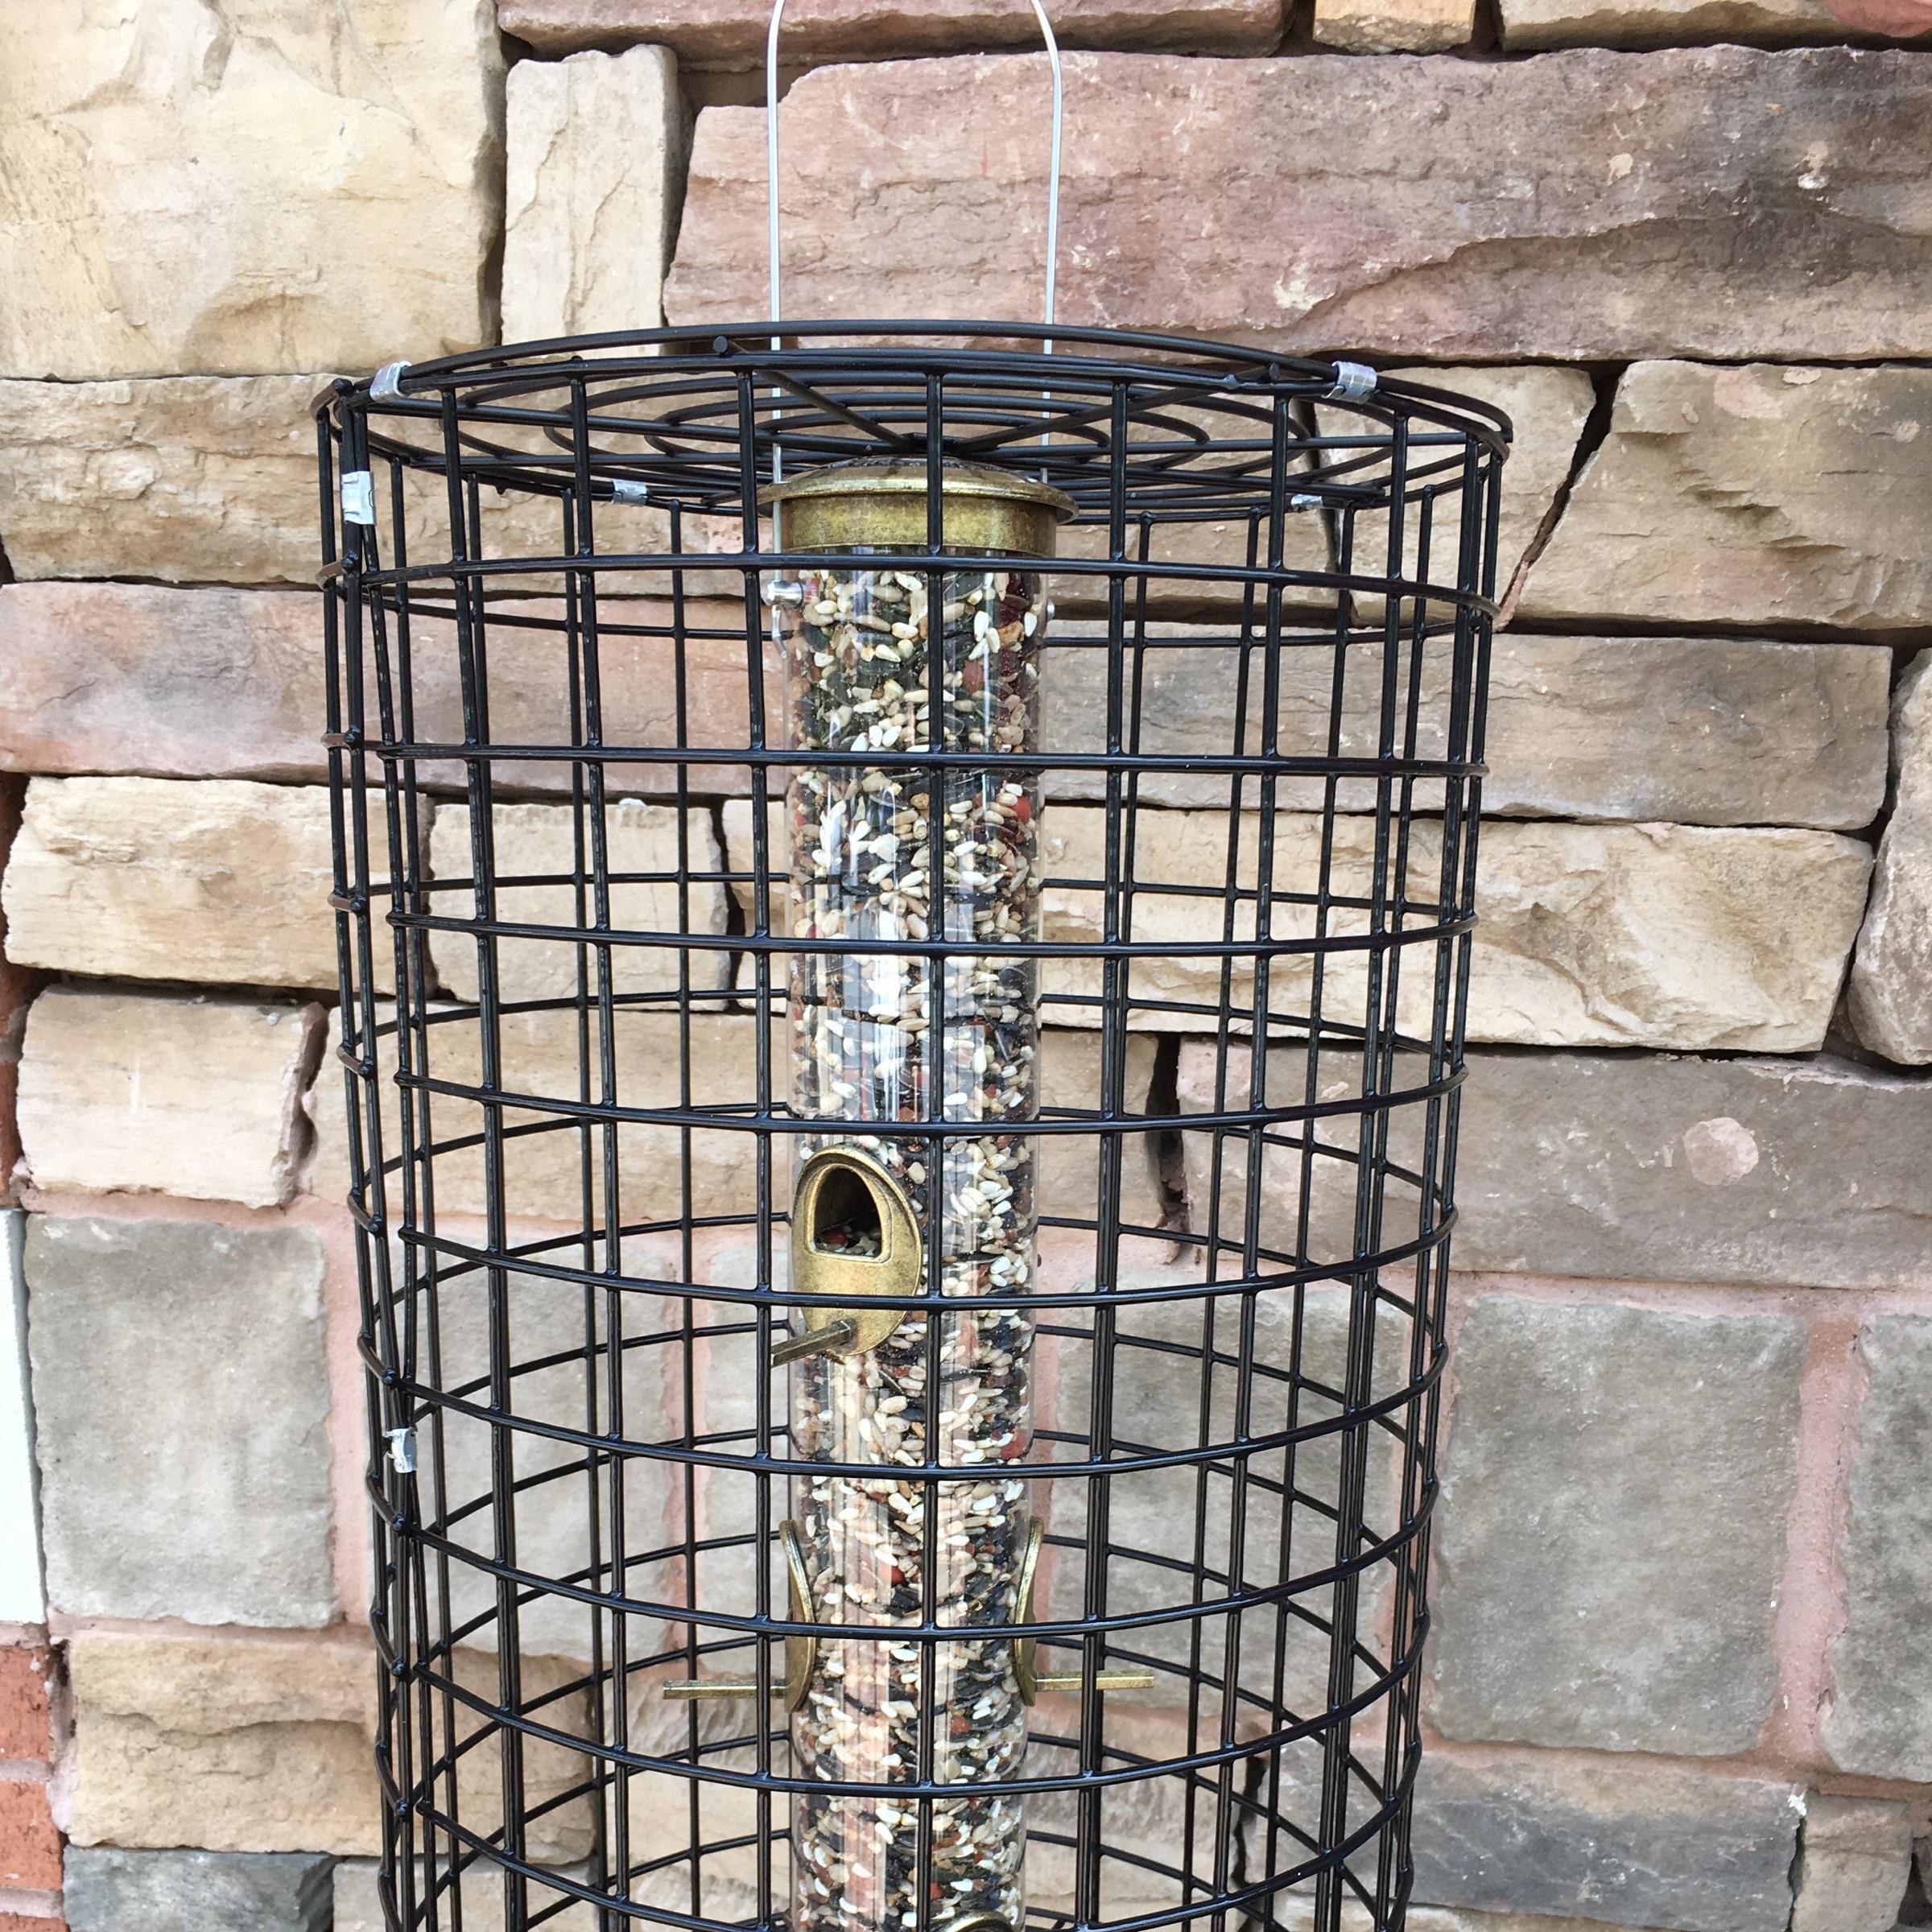 squirrel proof, squirrel resistant, cole's feeder, cage